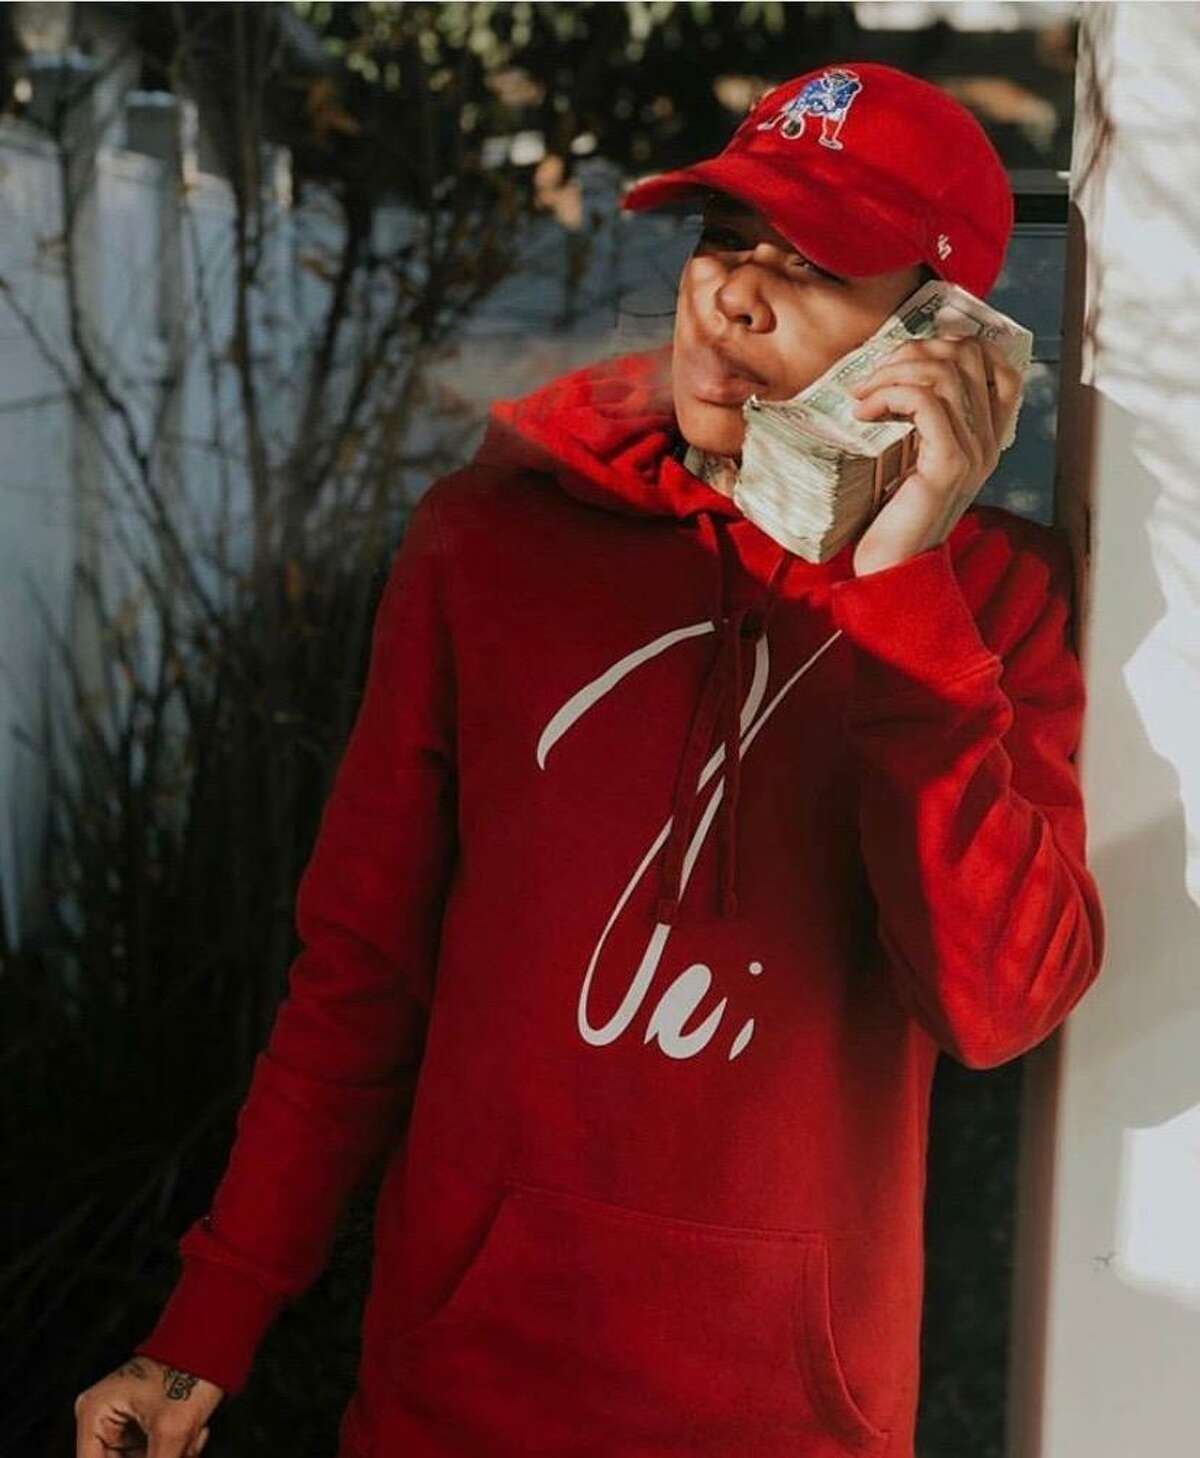 Houston hip-hop artist Bloodbath